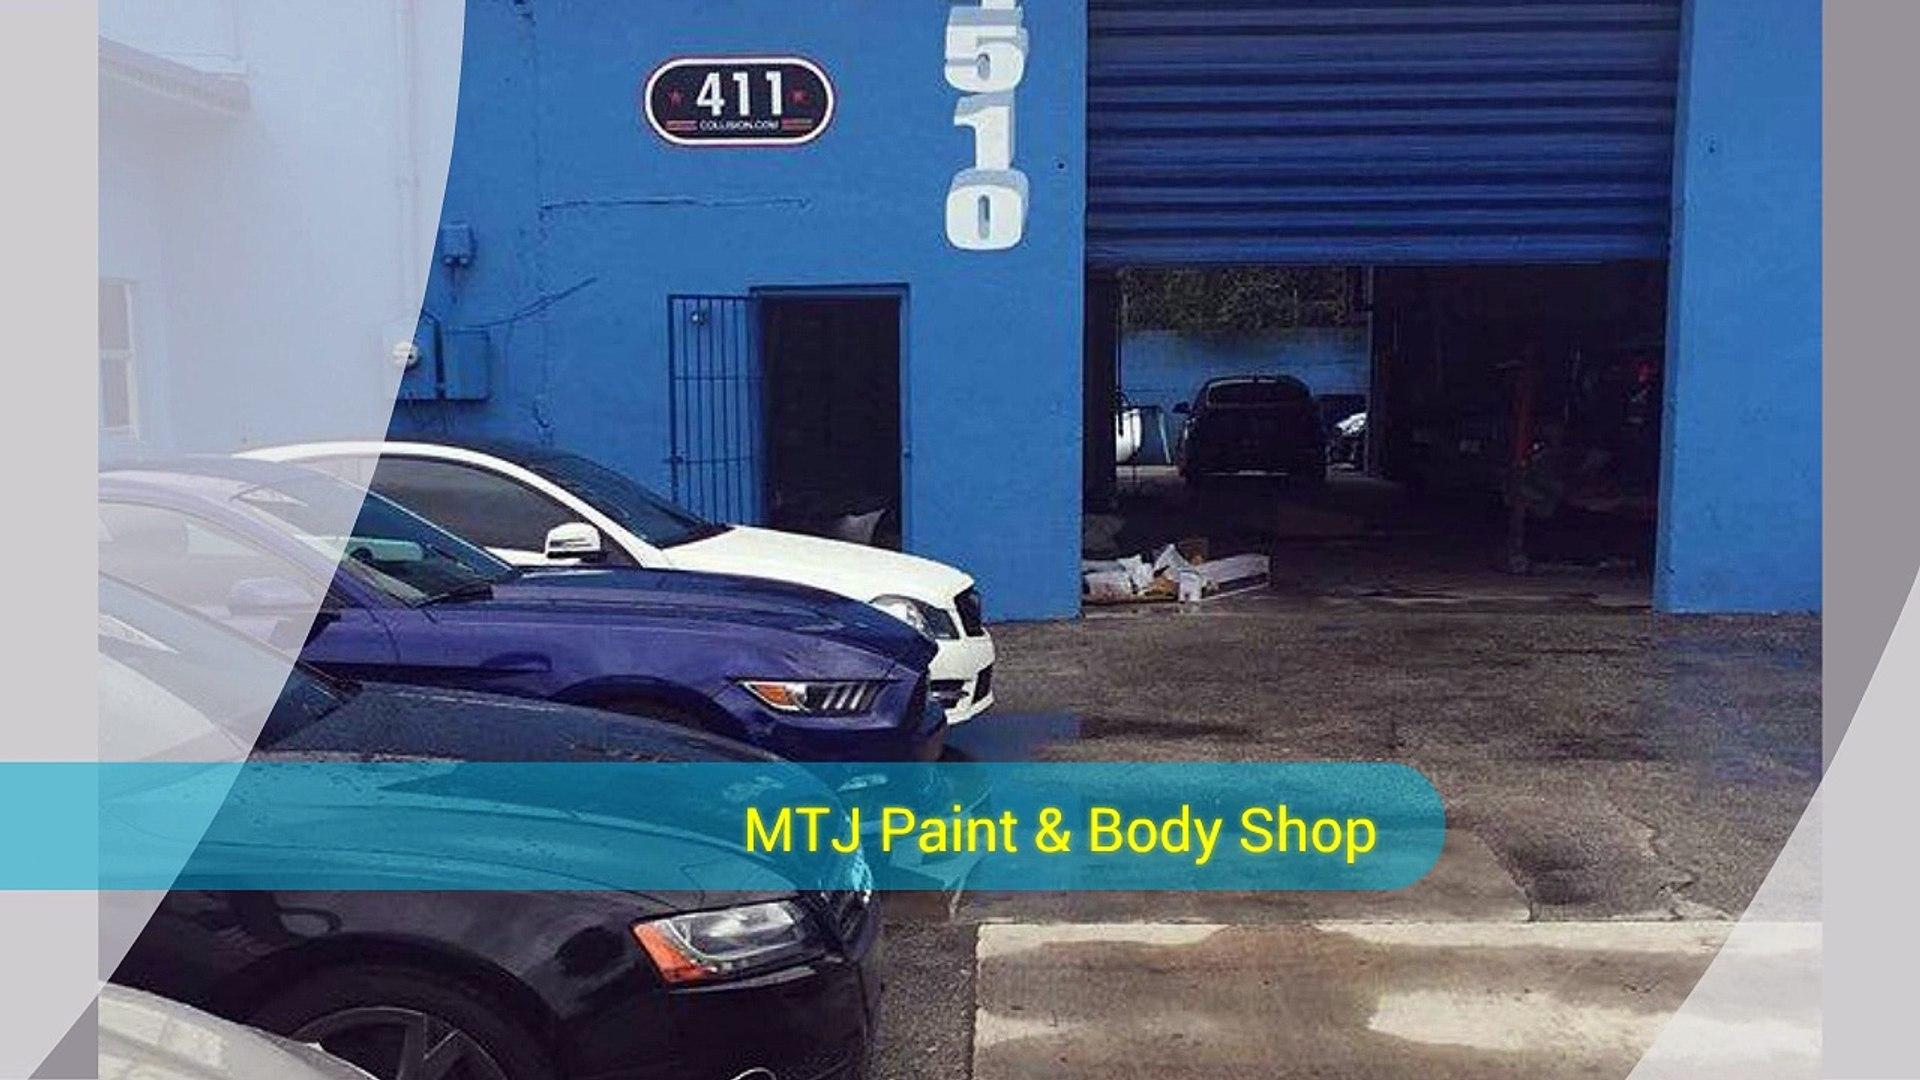 Tow Truck Miami - MTJ Paint & Body Shop (305) 632-1914